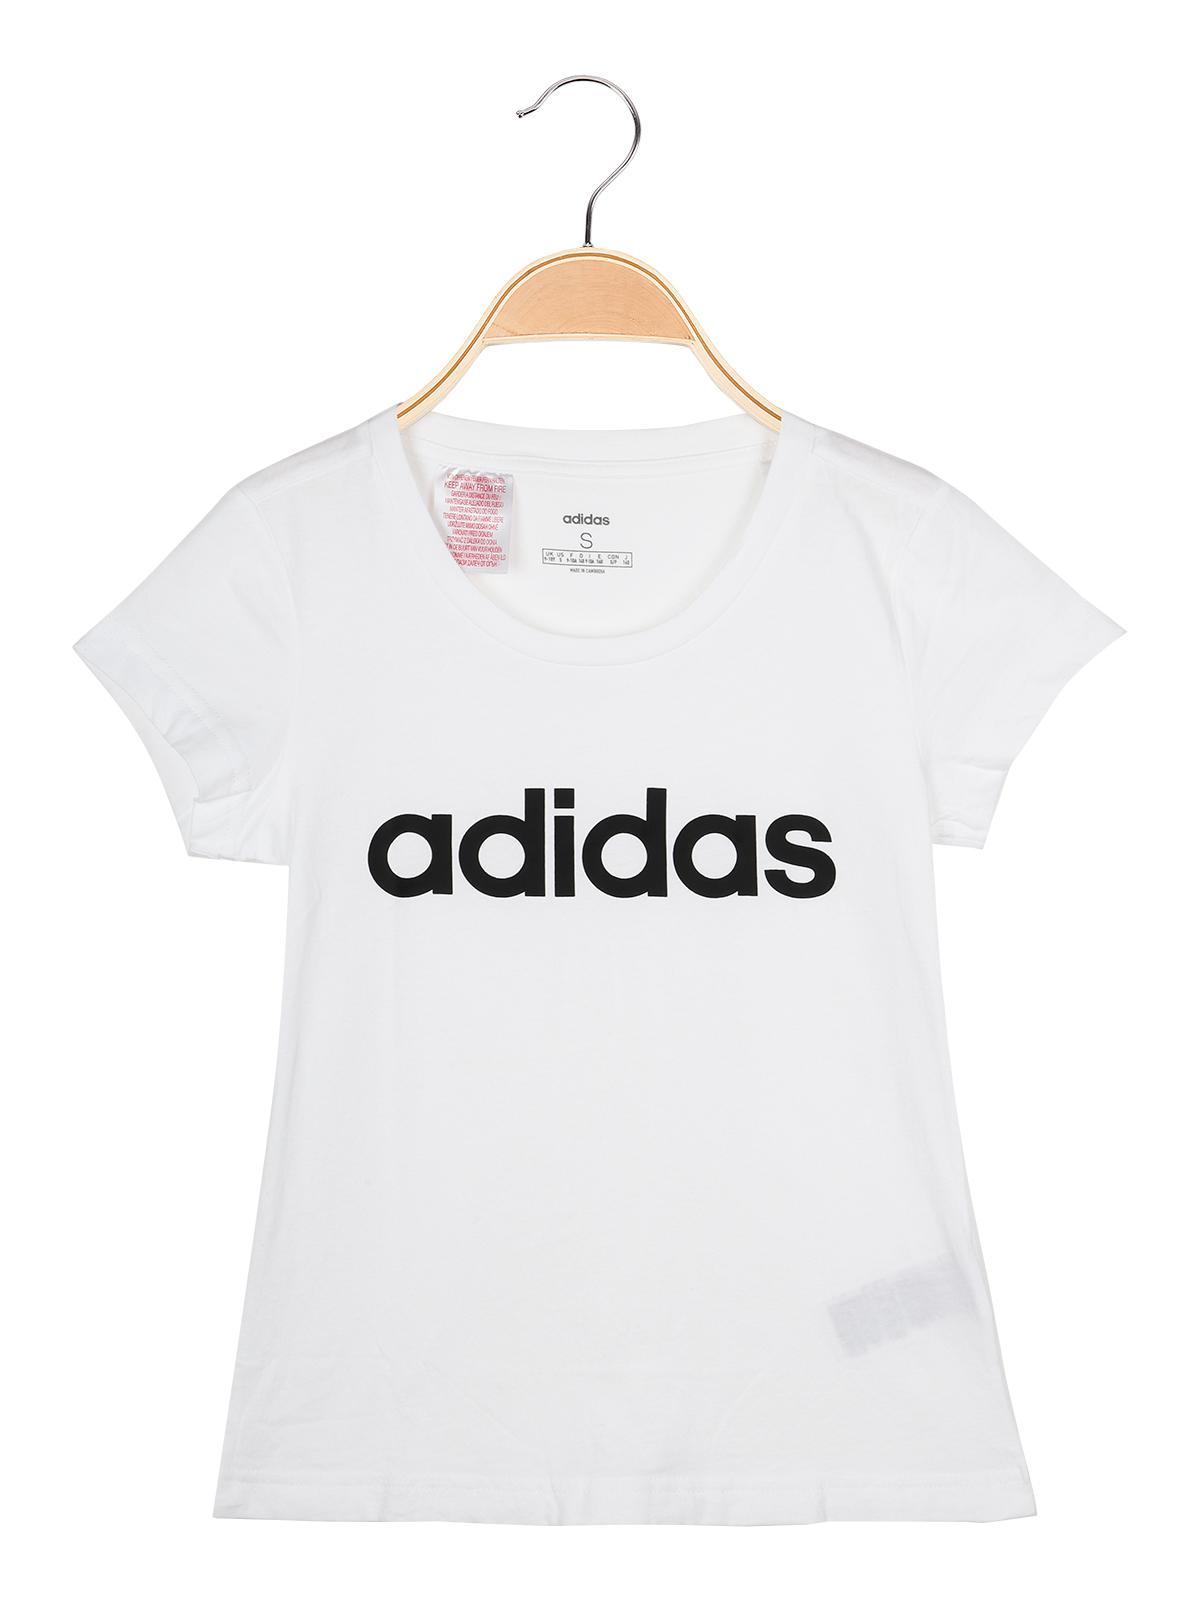 Essentials lineat logo t shirt bianca con stampa adidas